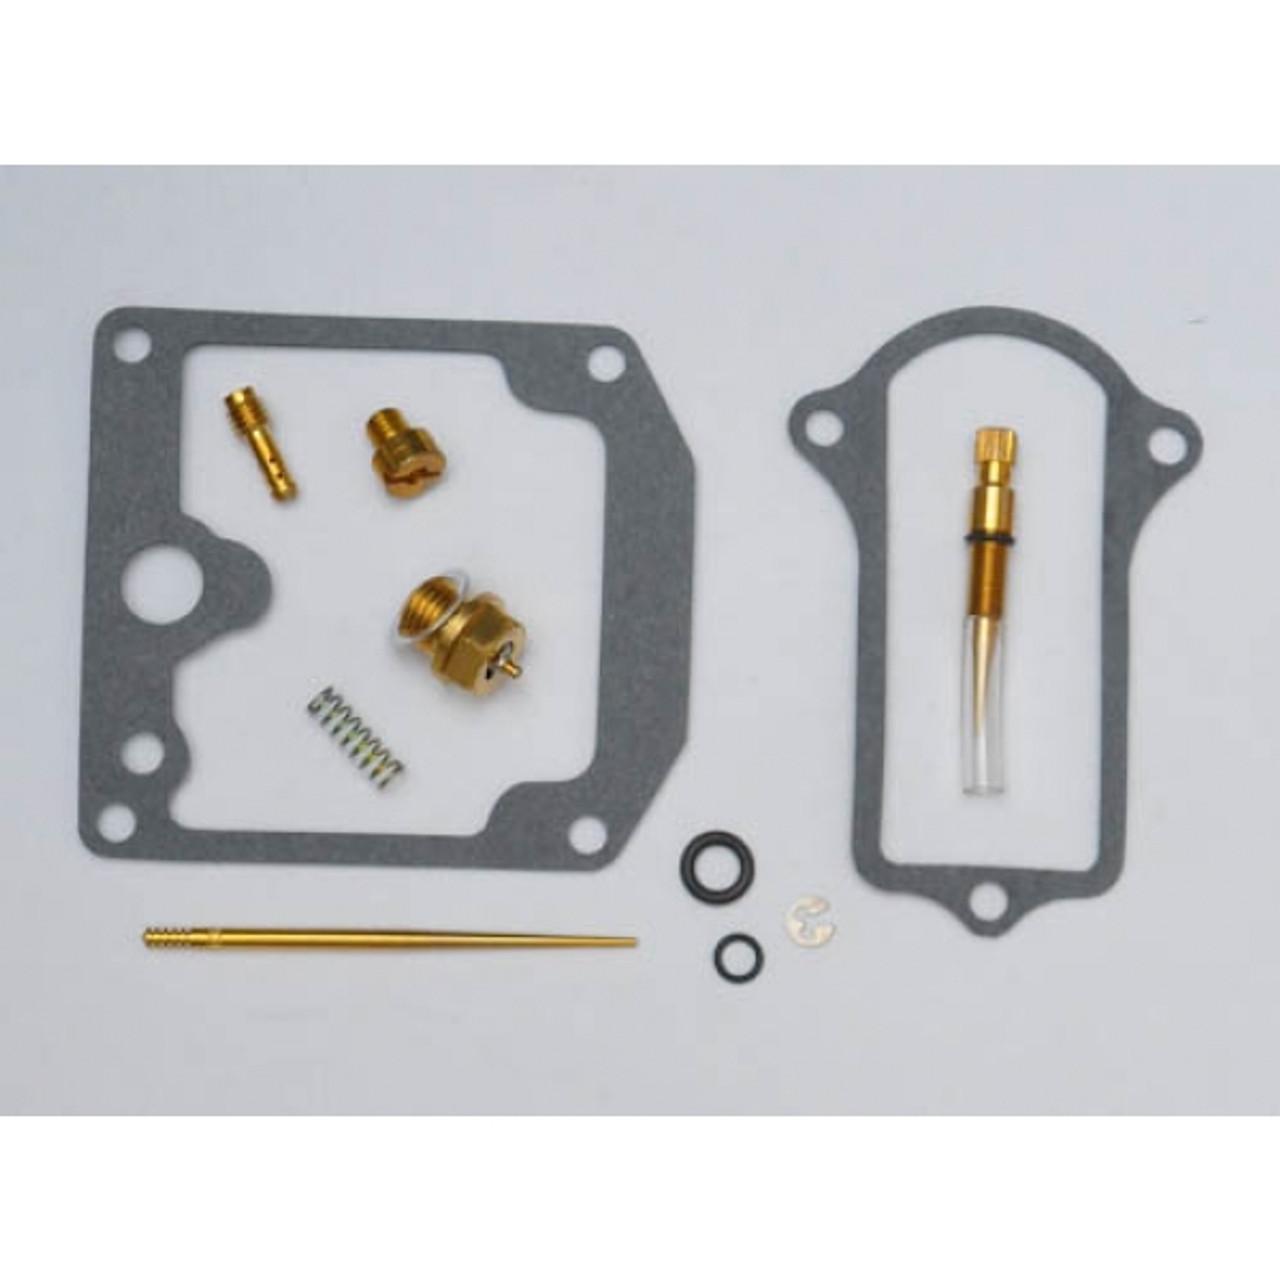 Kawasaki Carb Repair Kit KZ650 (77-79)